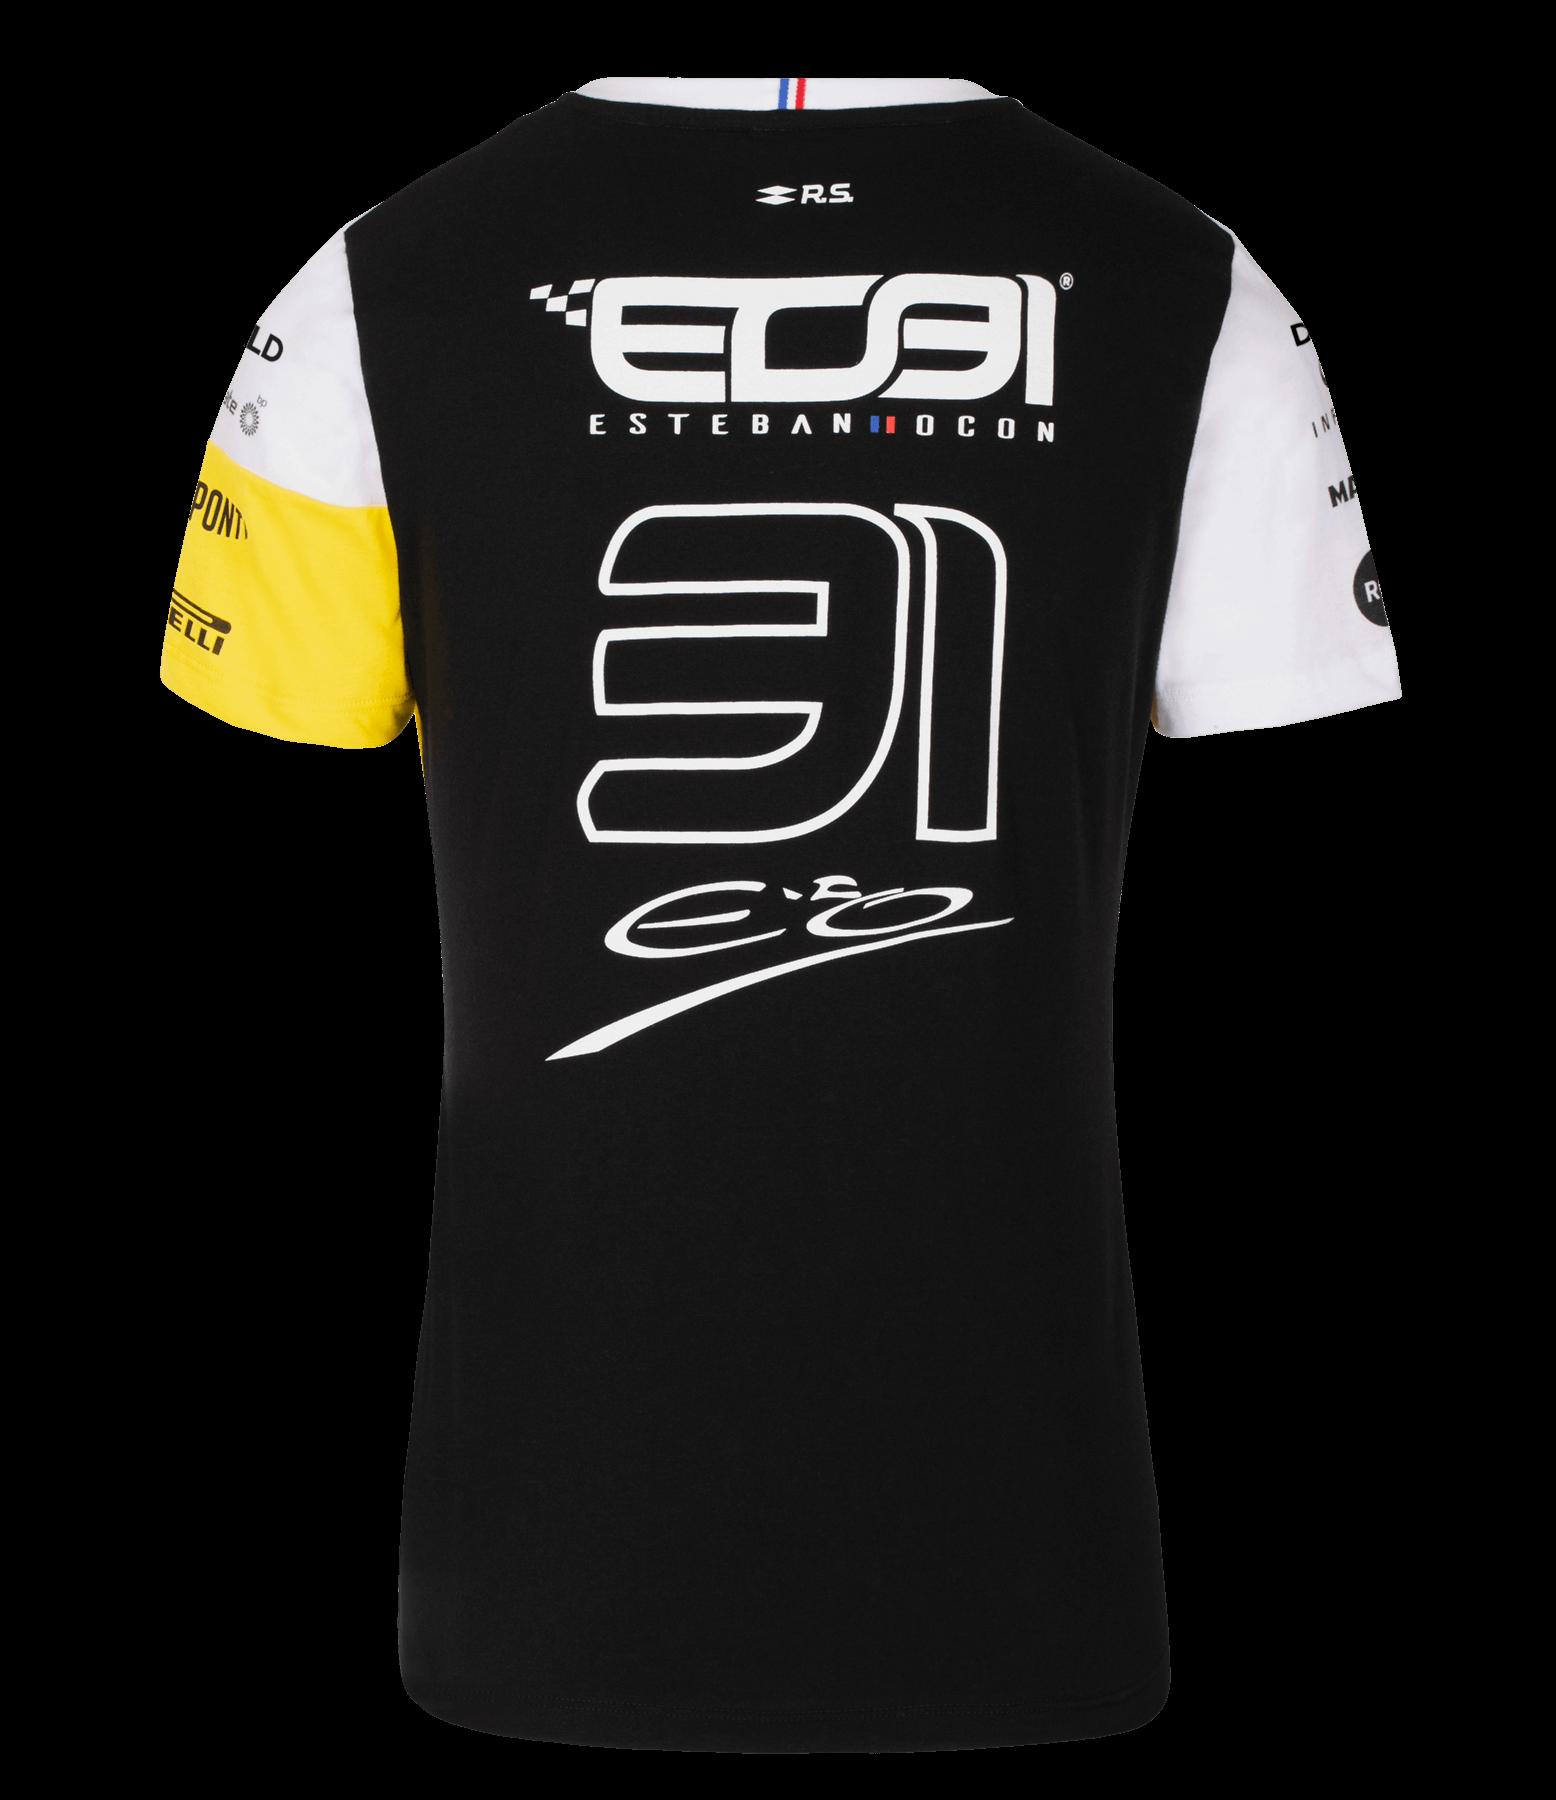 RENAULT DP WORLD F1® TEAM 2020 #31 Ocon women's t-shirt